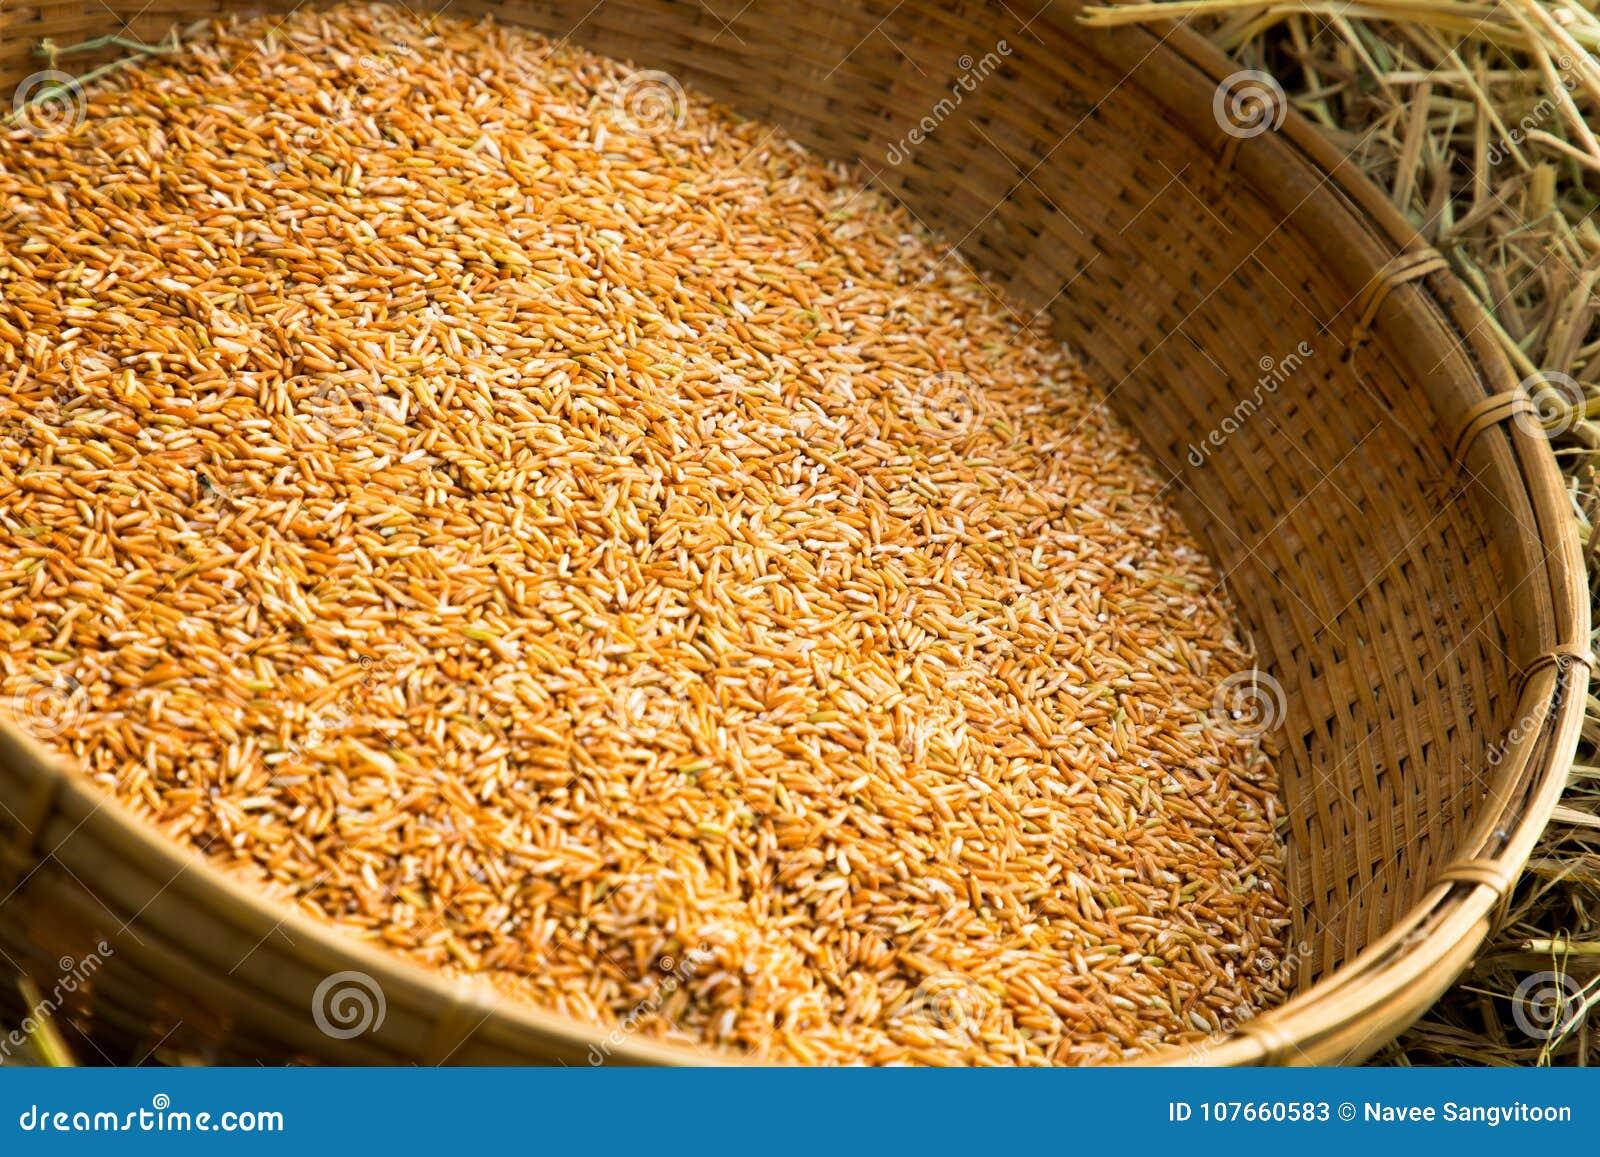 Thai organic red jasmine stock image. Image of grains